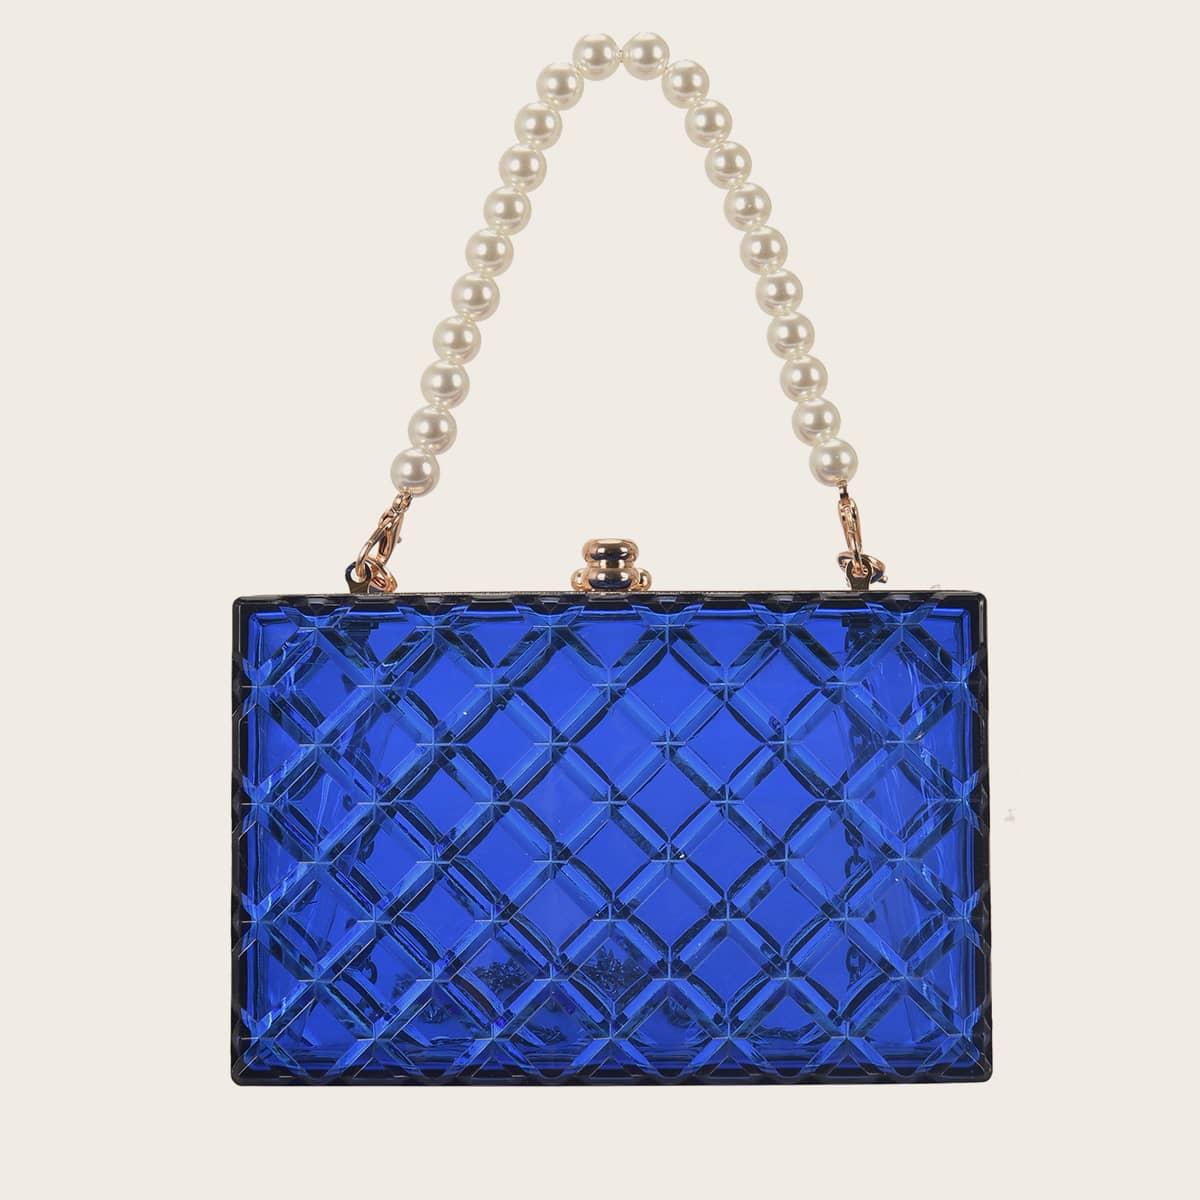 SHEIN / Metal Lock Faux Pearl Decor Box Bag